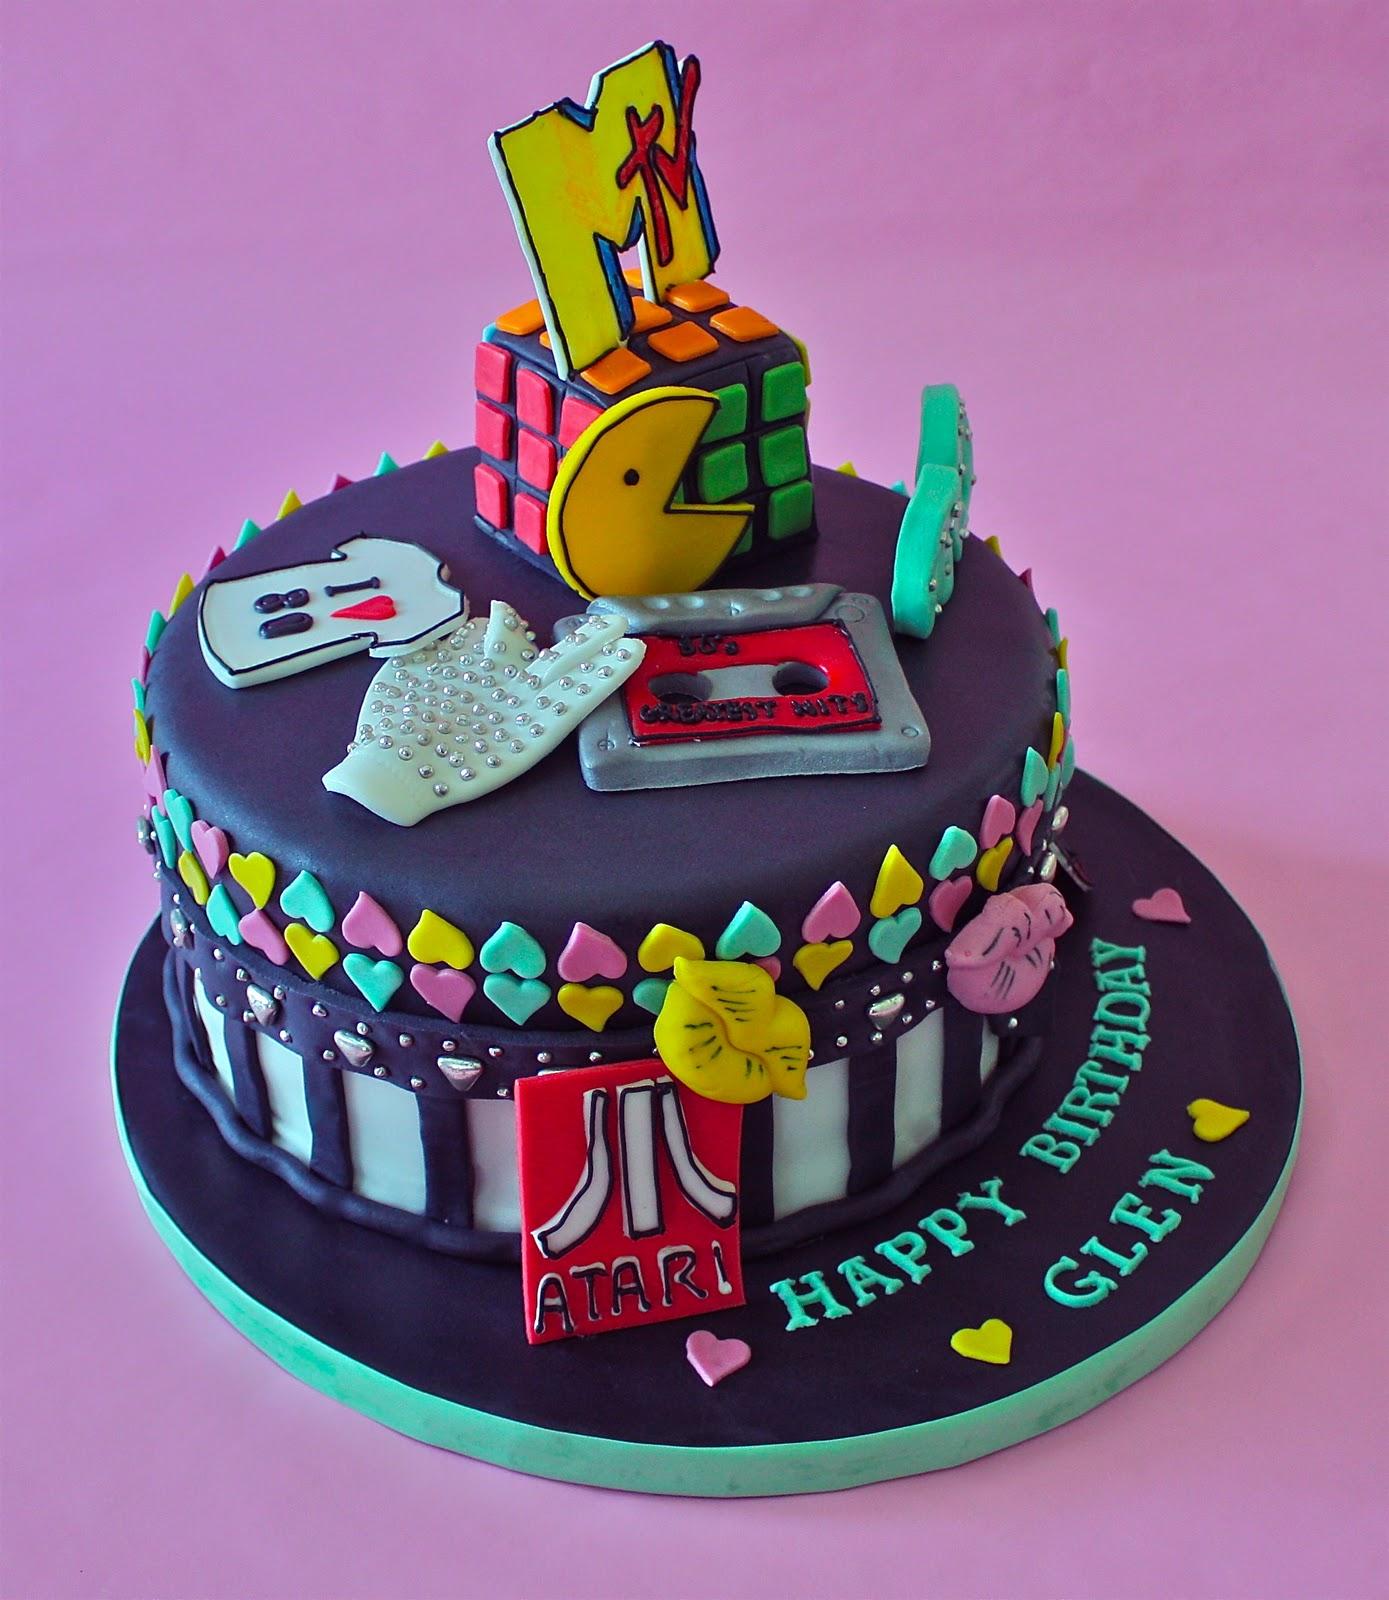 -: 80'S THEME CAKE